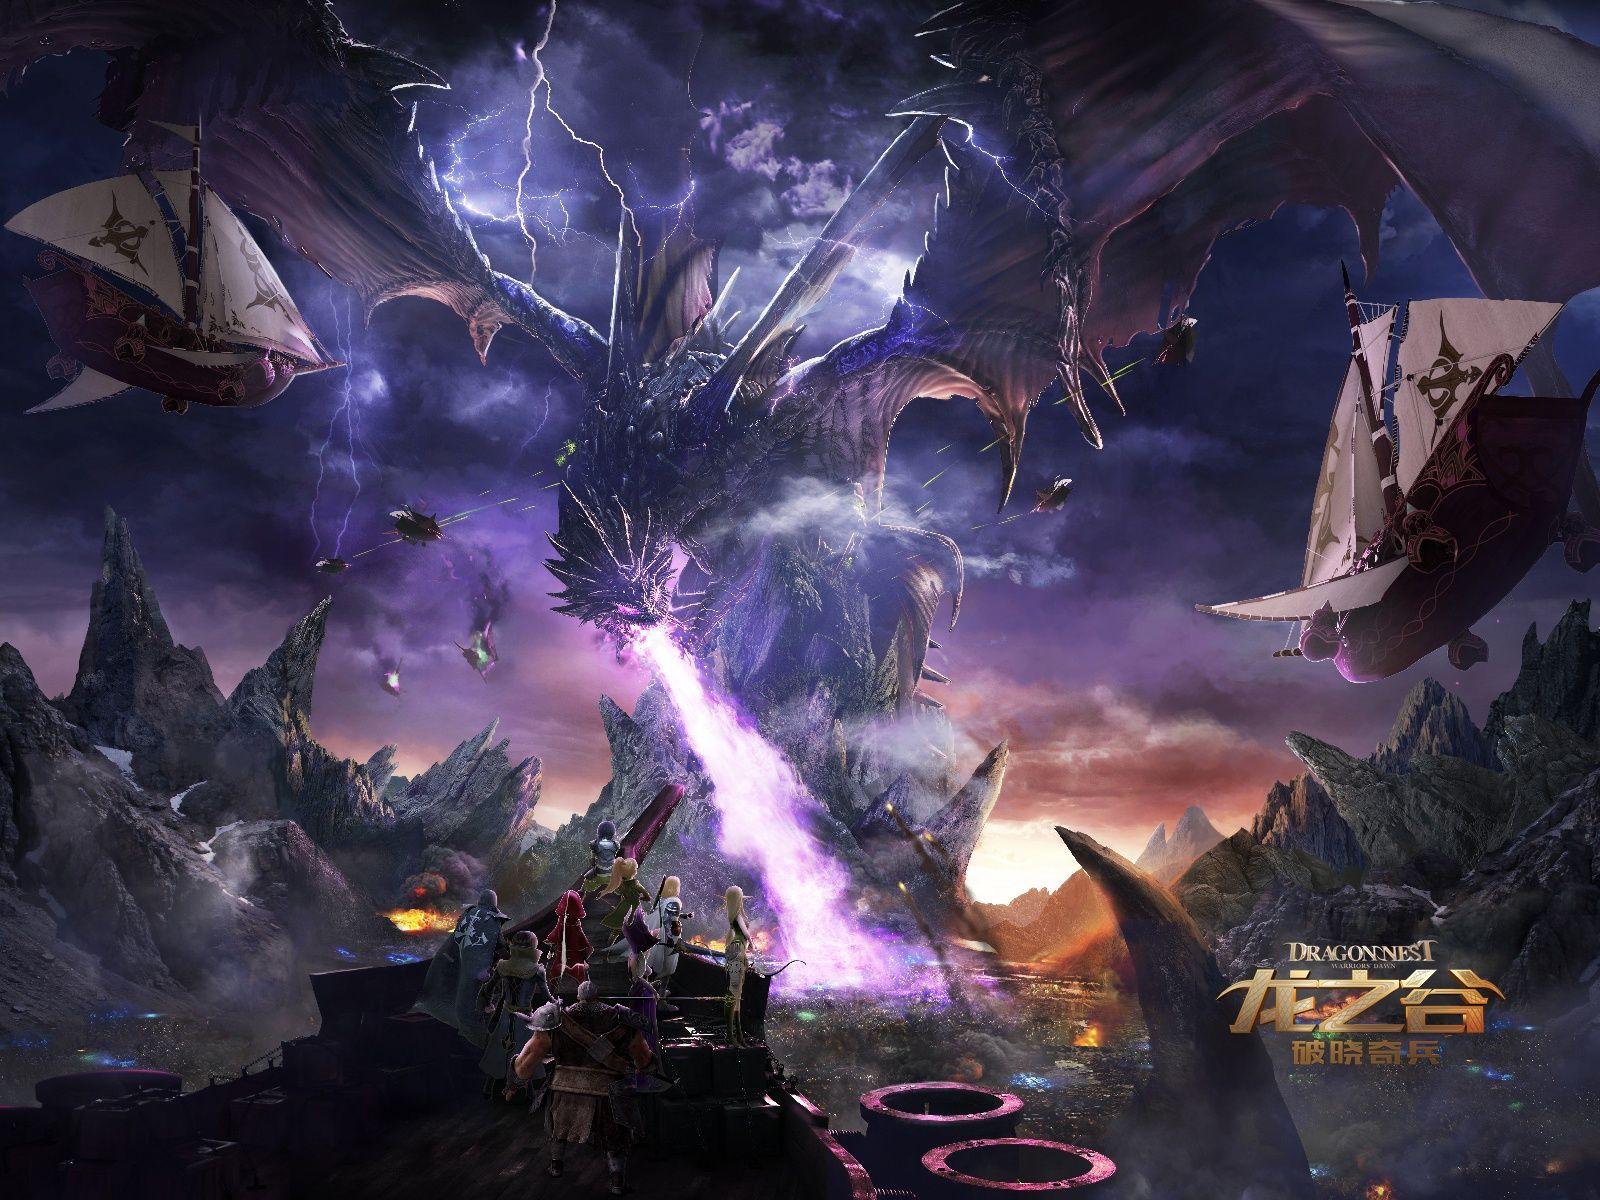 Black Dragon Raid 1600x1200 Dragon Nest Cool Art Artist Inspiration Desktop dragon nest sea wallpaper hd